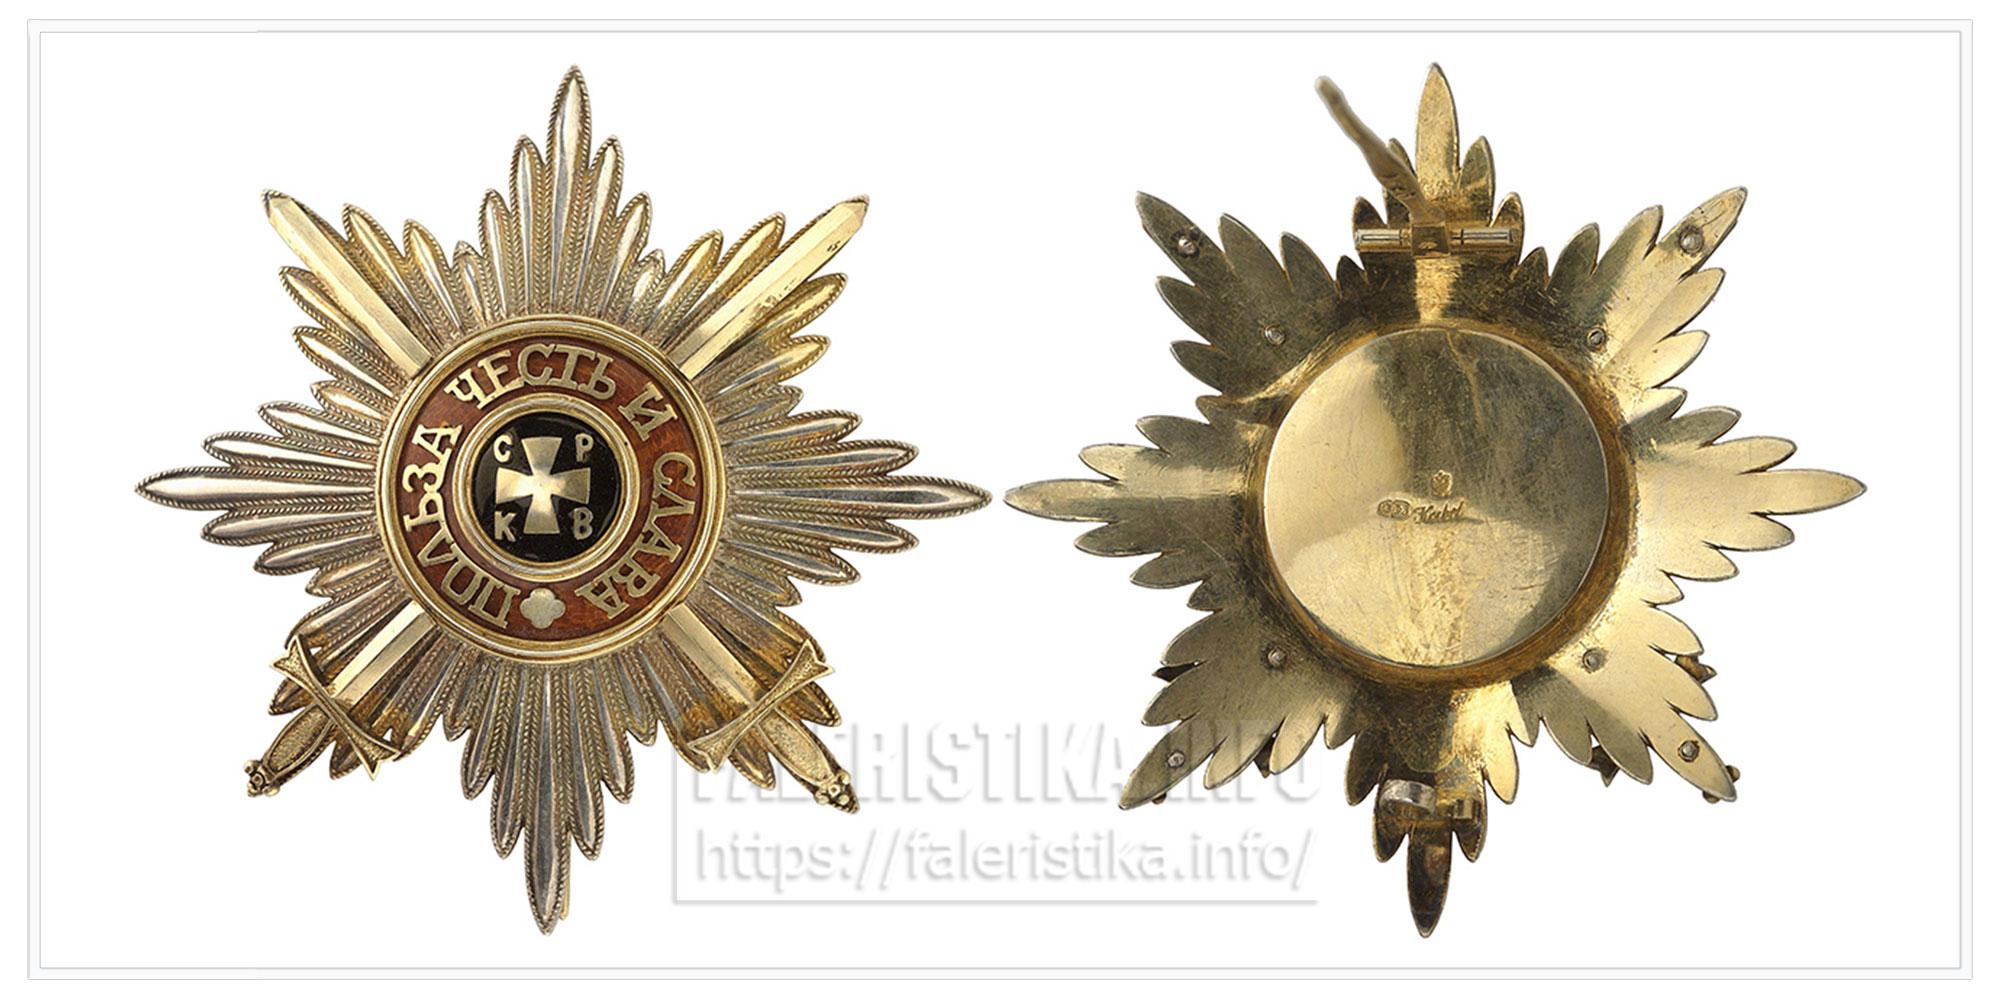 Звезда ордена Святого Владимира с мечами